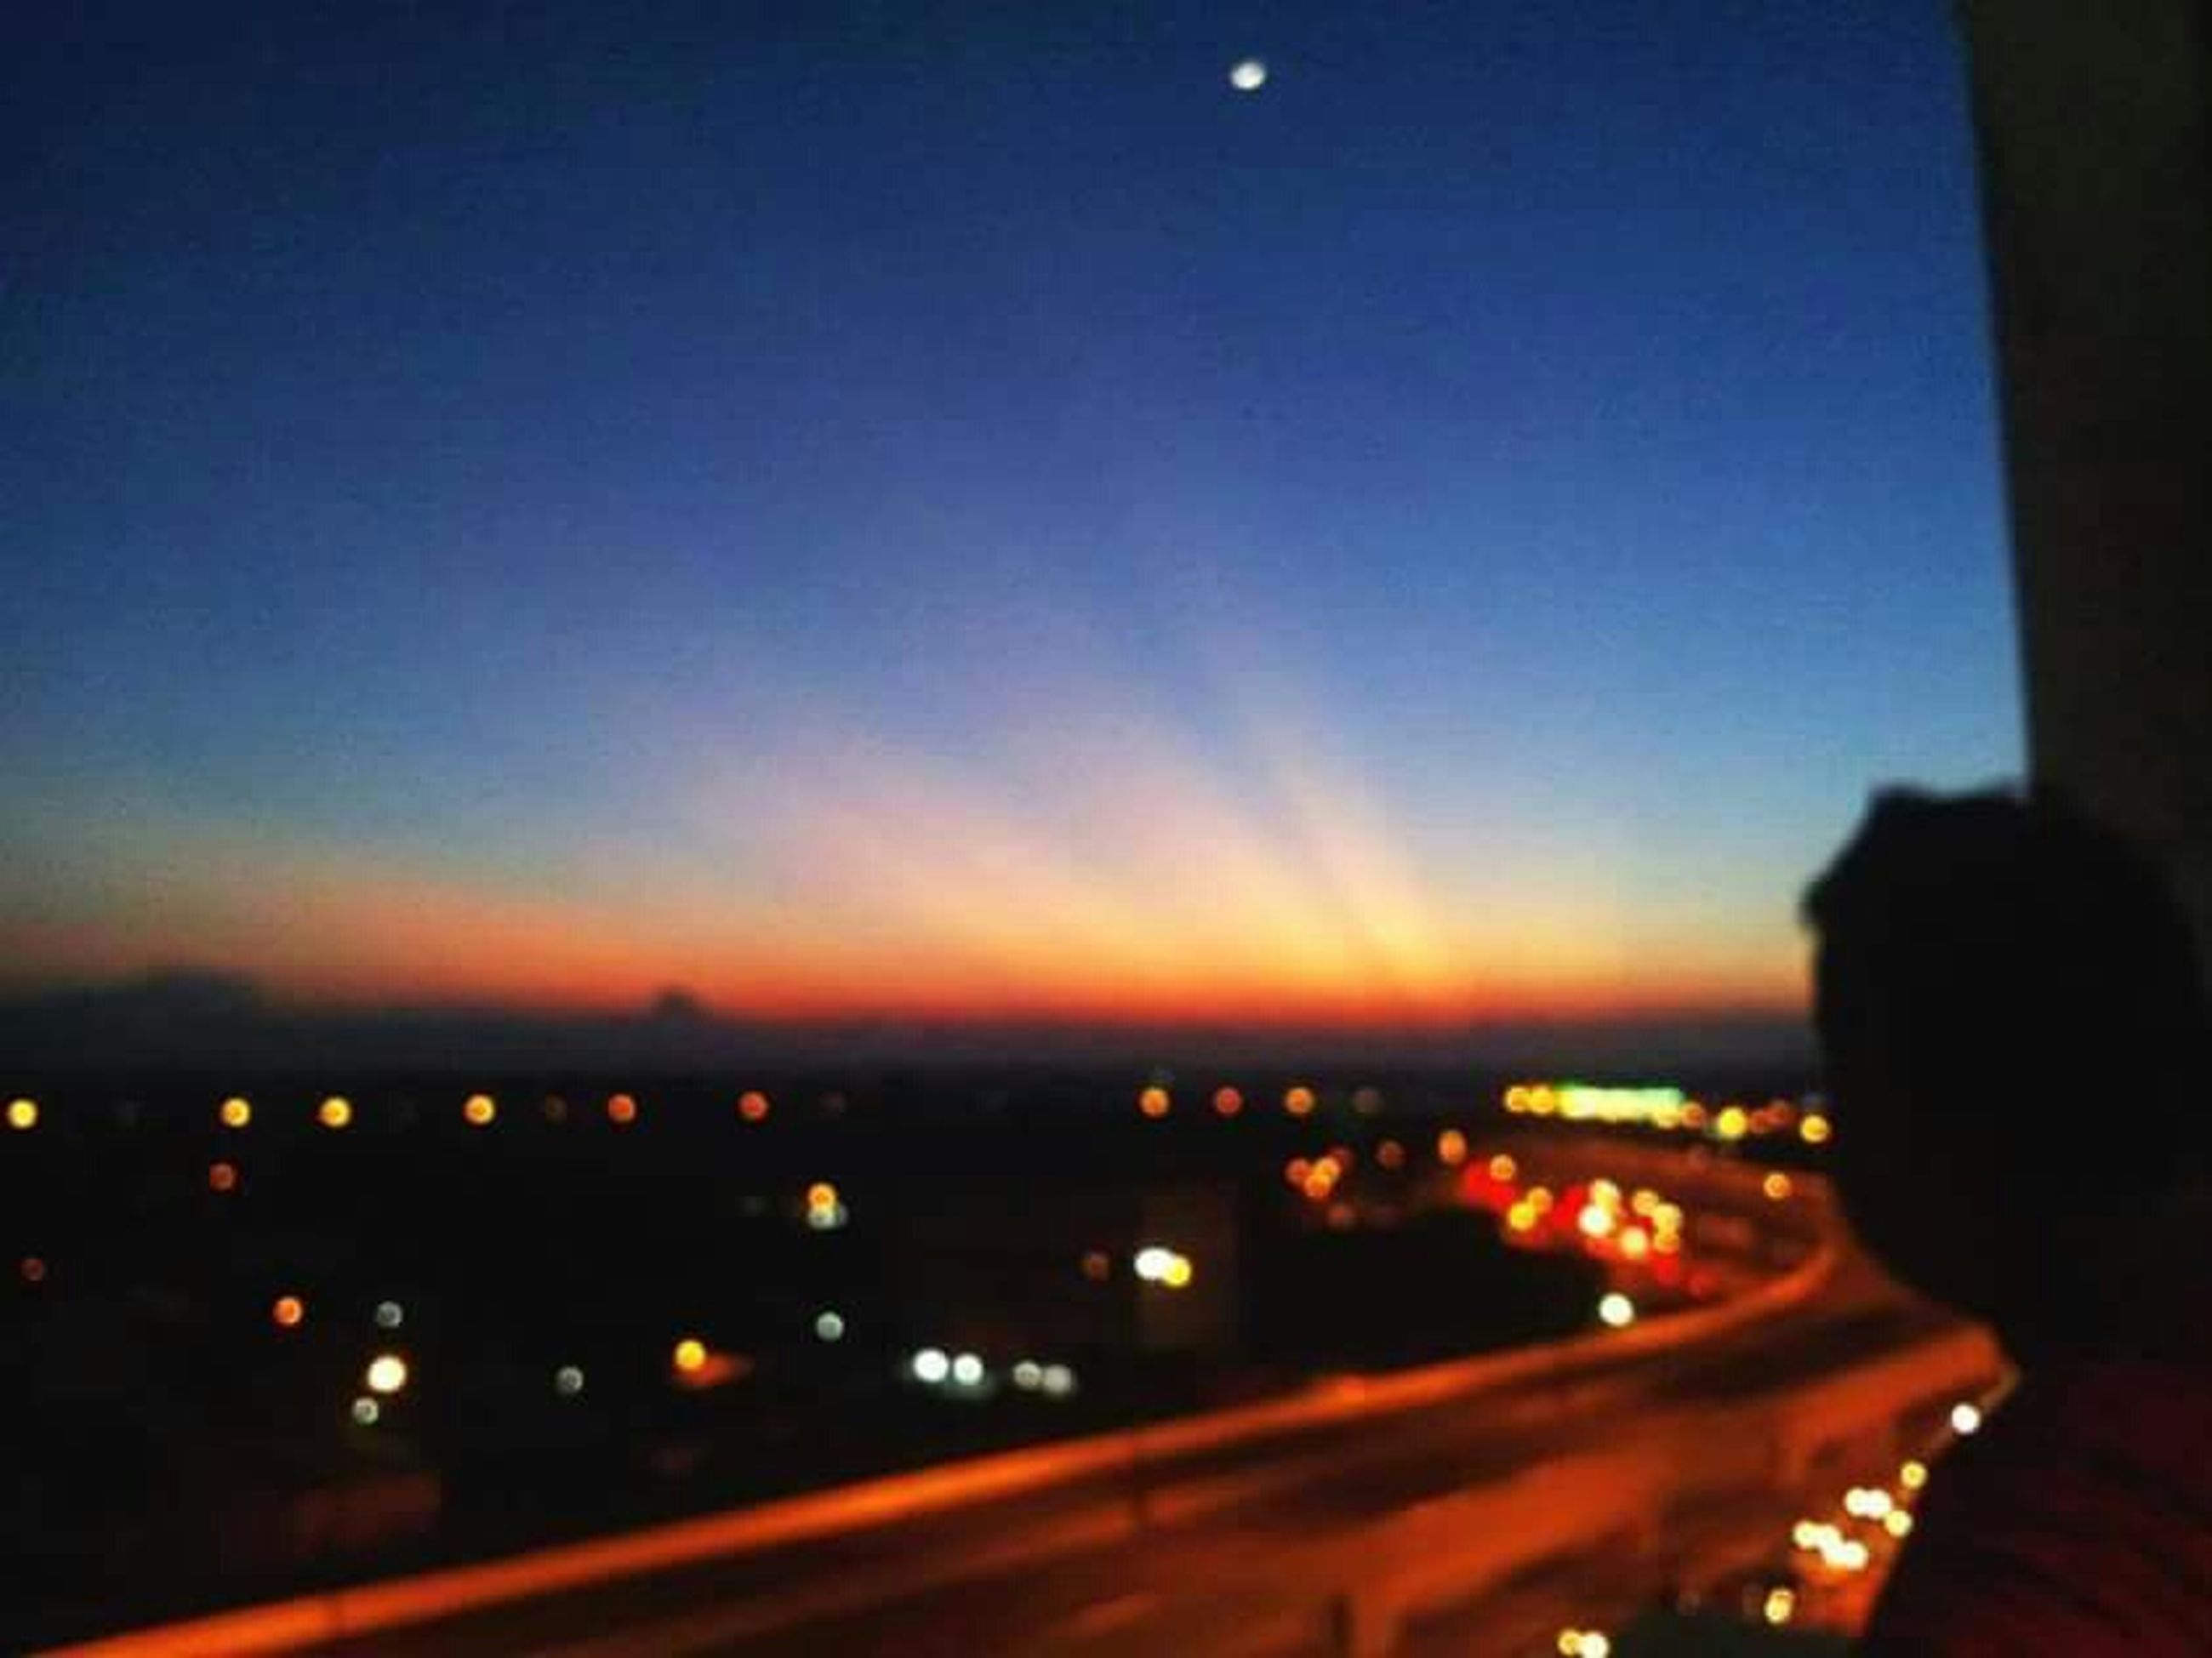 illuminated, night, transportation, sky, dusk, city, clear sky, copy space, defocused, long exposure, light trail, sunset, light - natural phenomenon, light, blue, silhouette, road, dark, blurred motion, lighting equipment